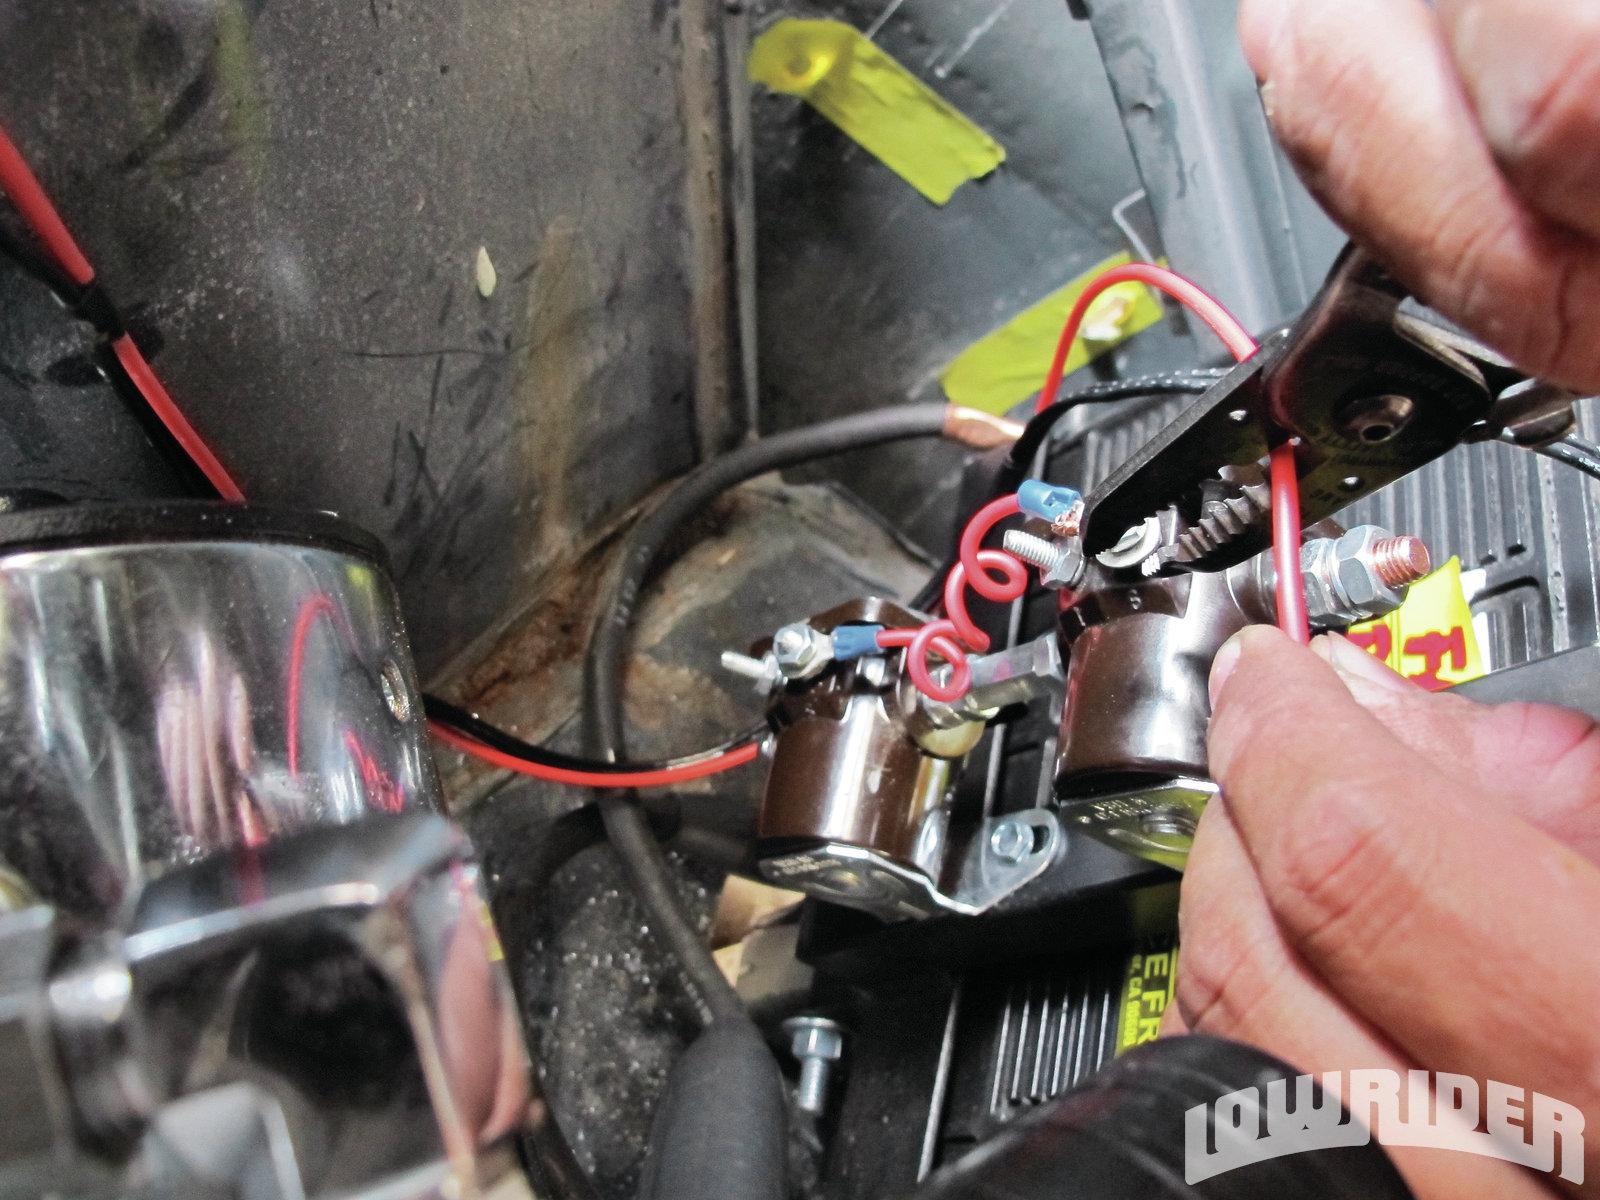 Black magic hydraulics set up lowrider magazine 3339 cheapraybanclubmaster Image collections